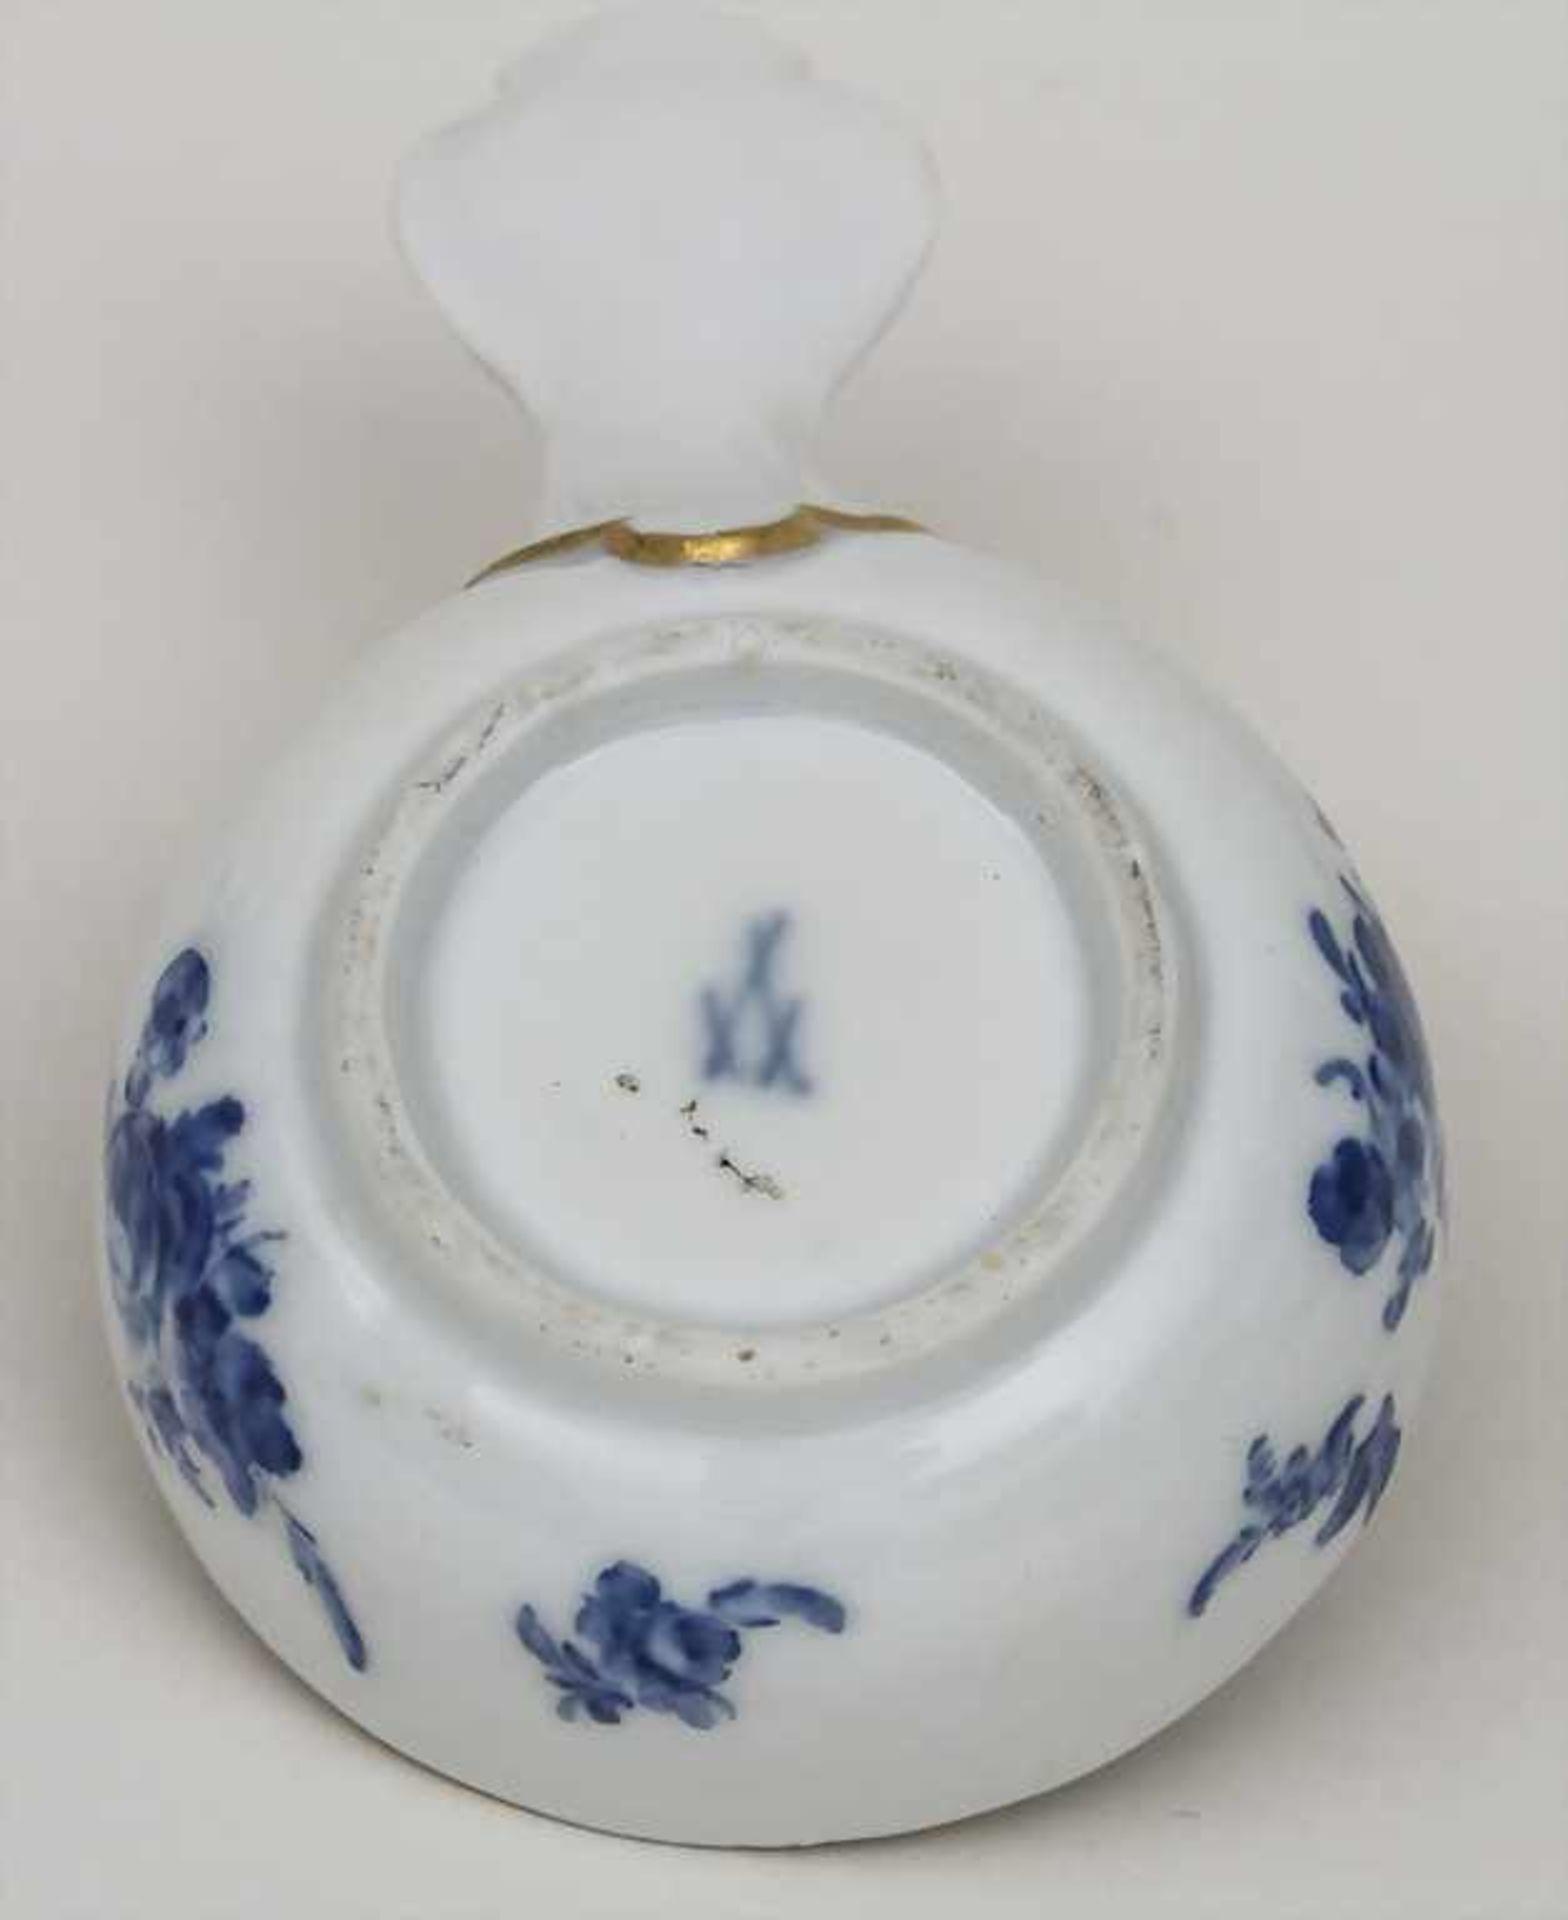 Kleines Henkelgefäß / A small dish with handle, Meissen, Anfang 19. Jh. Material: Porzellan, - Bild 2 aus 2